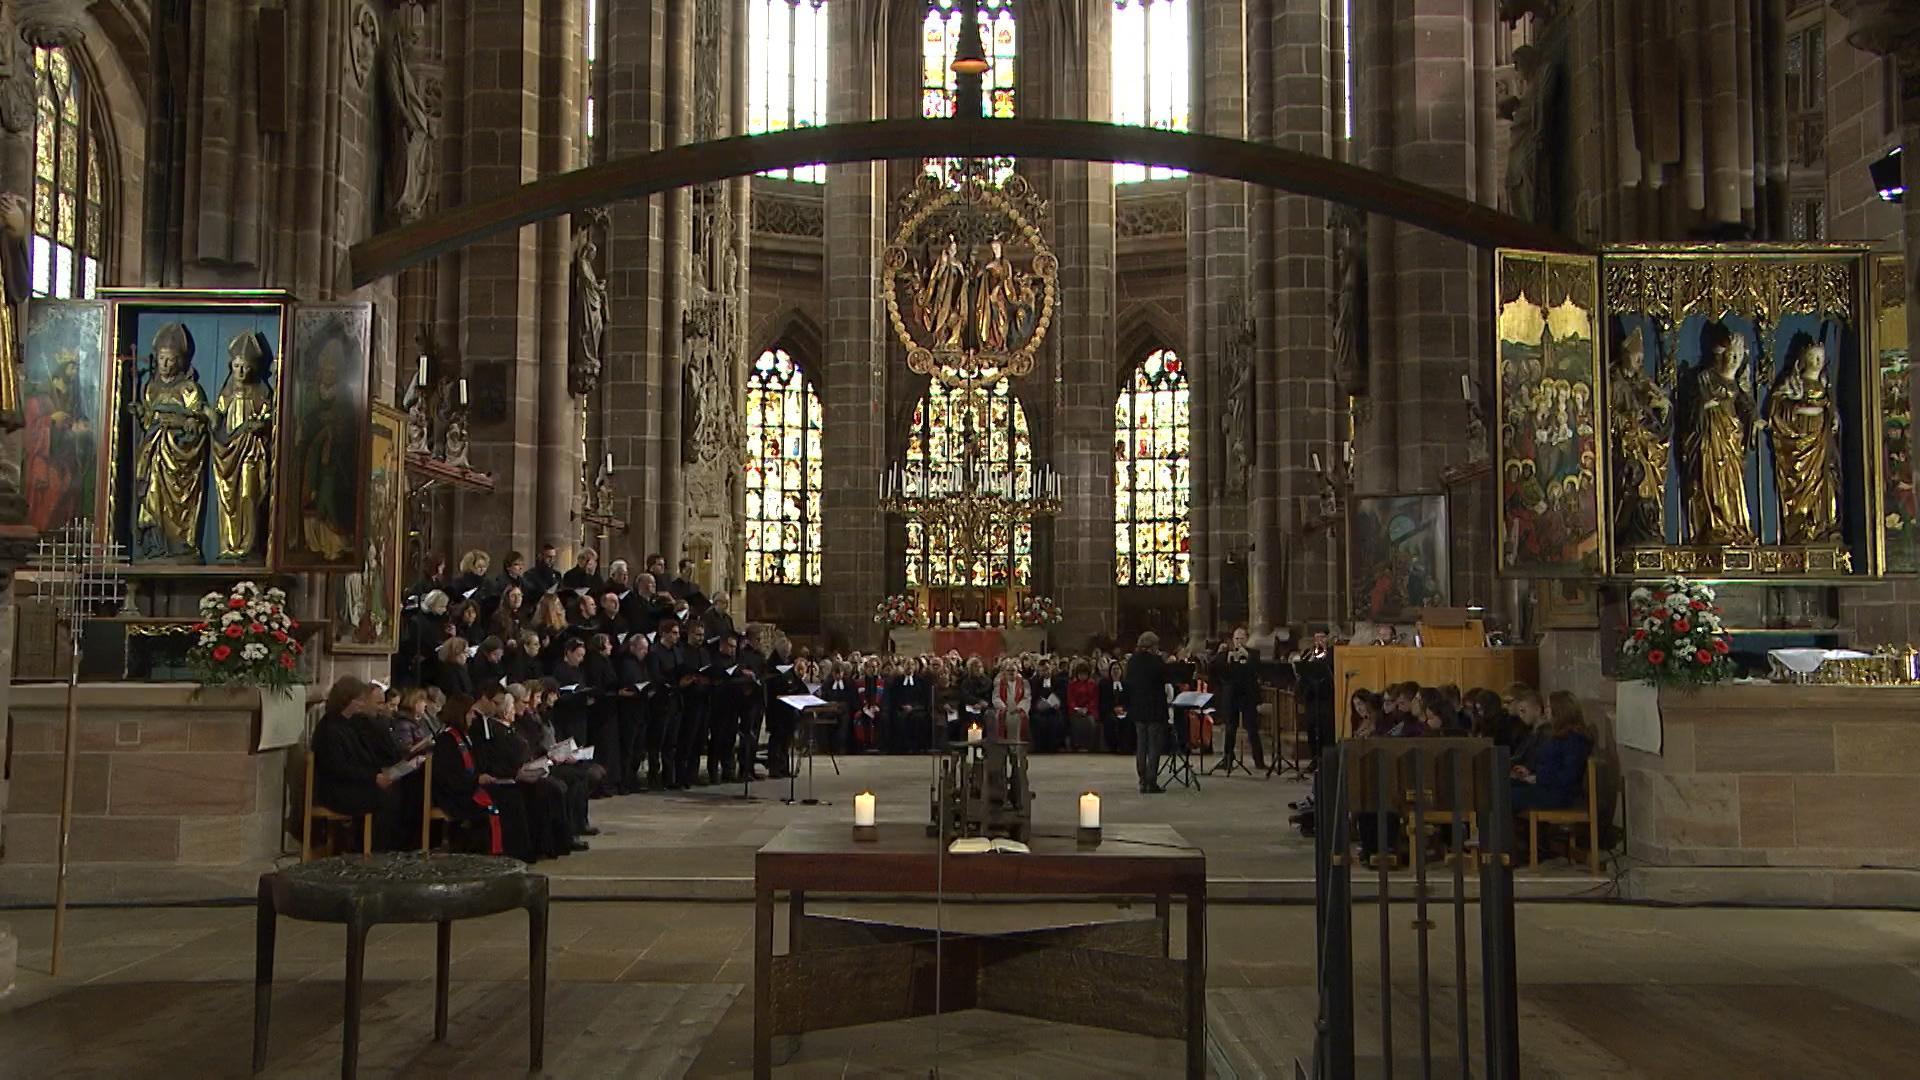 sprengung katholische kirche rostock